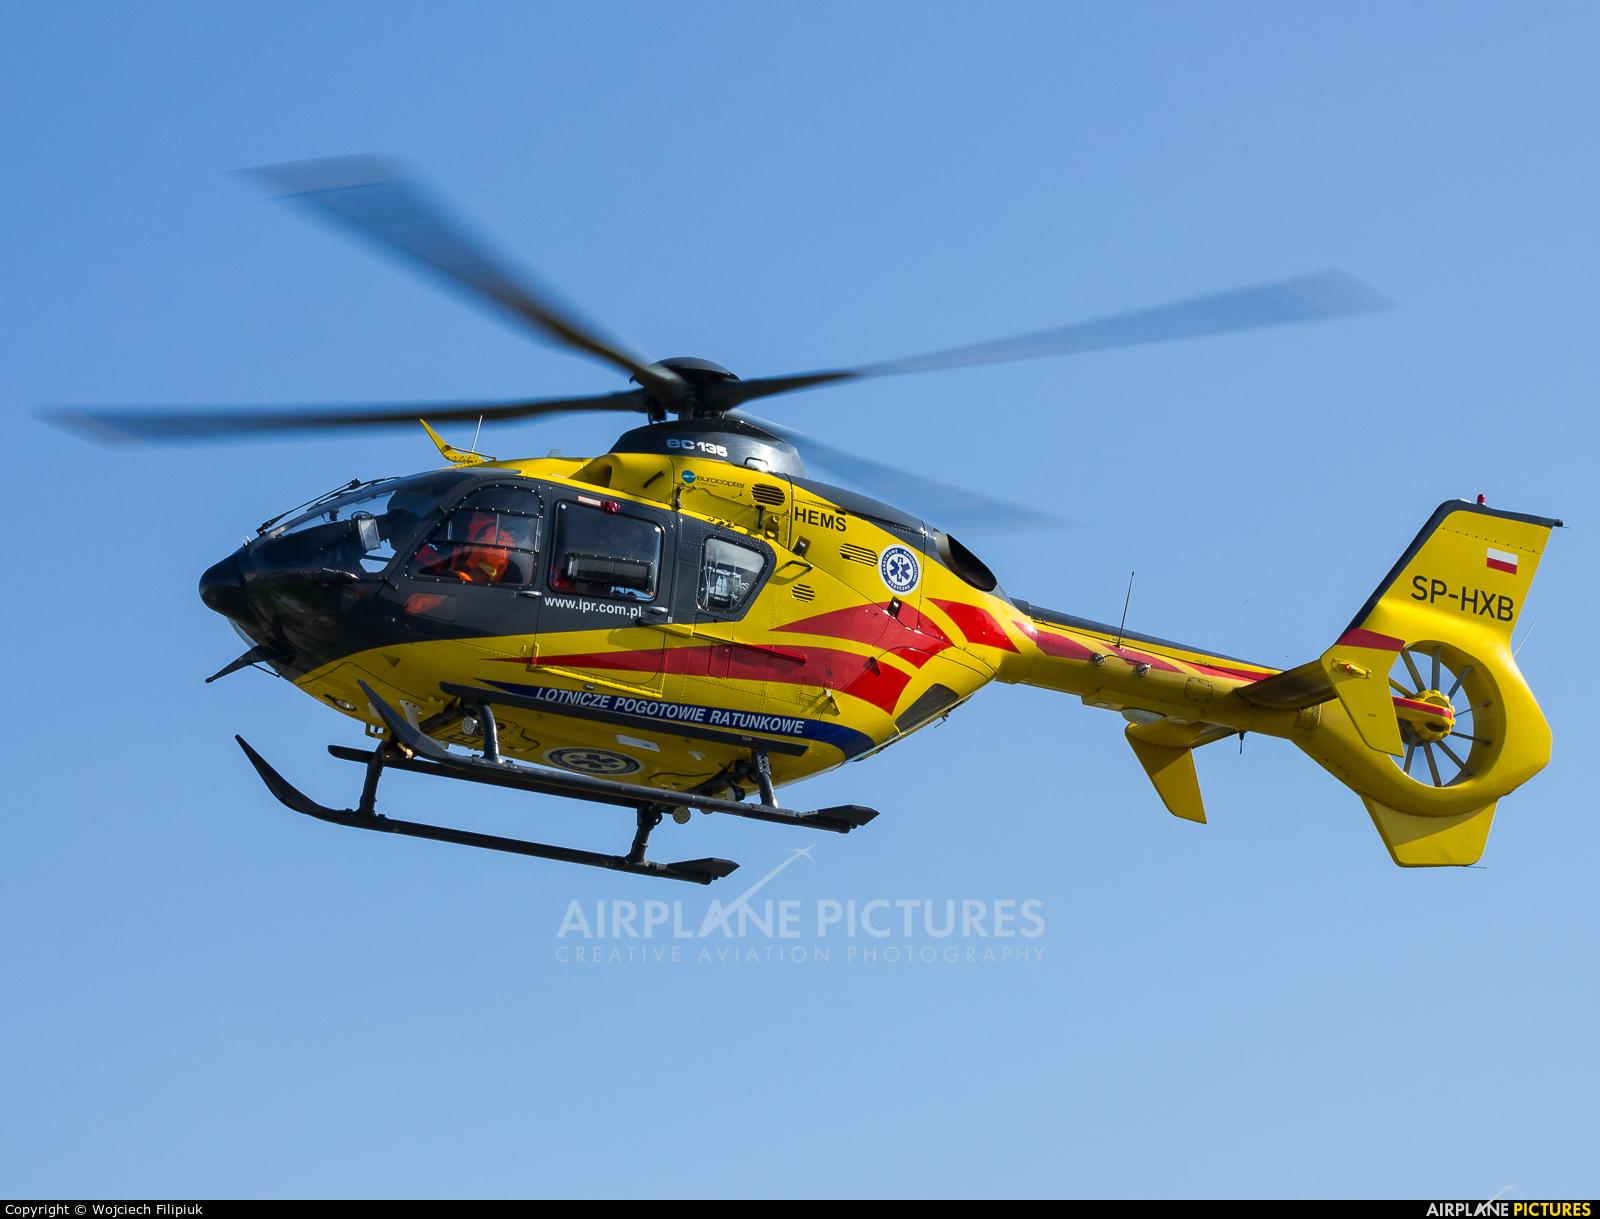 Polish Medical Air Rescue - Lotnicze Pogotowie Ratunkowe SP-HXB aircraft at Biała Podlaska